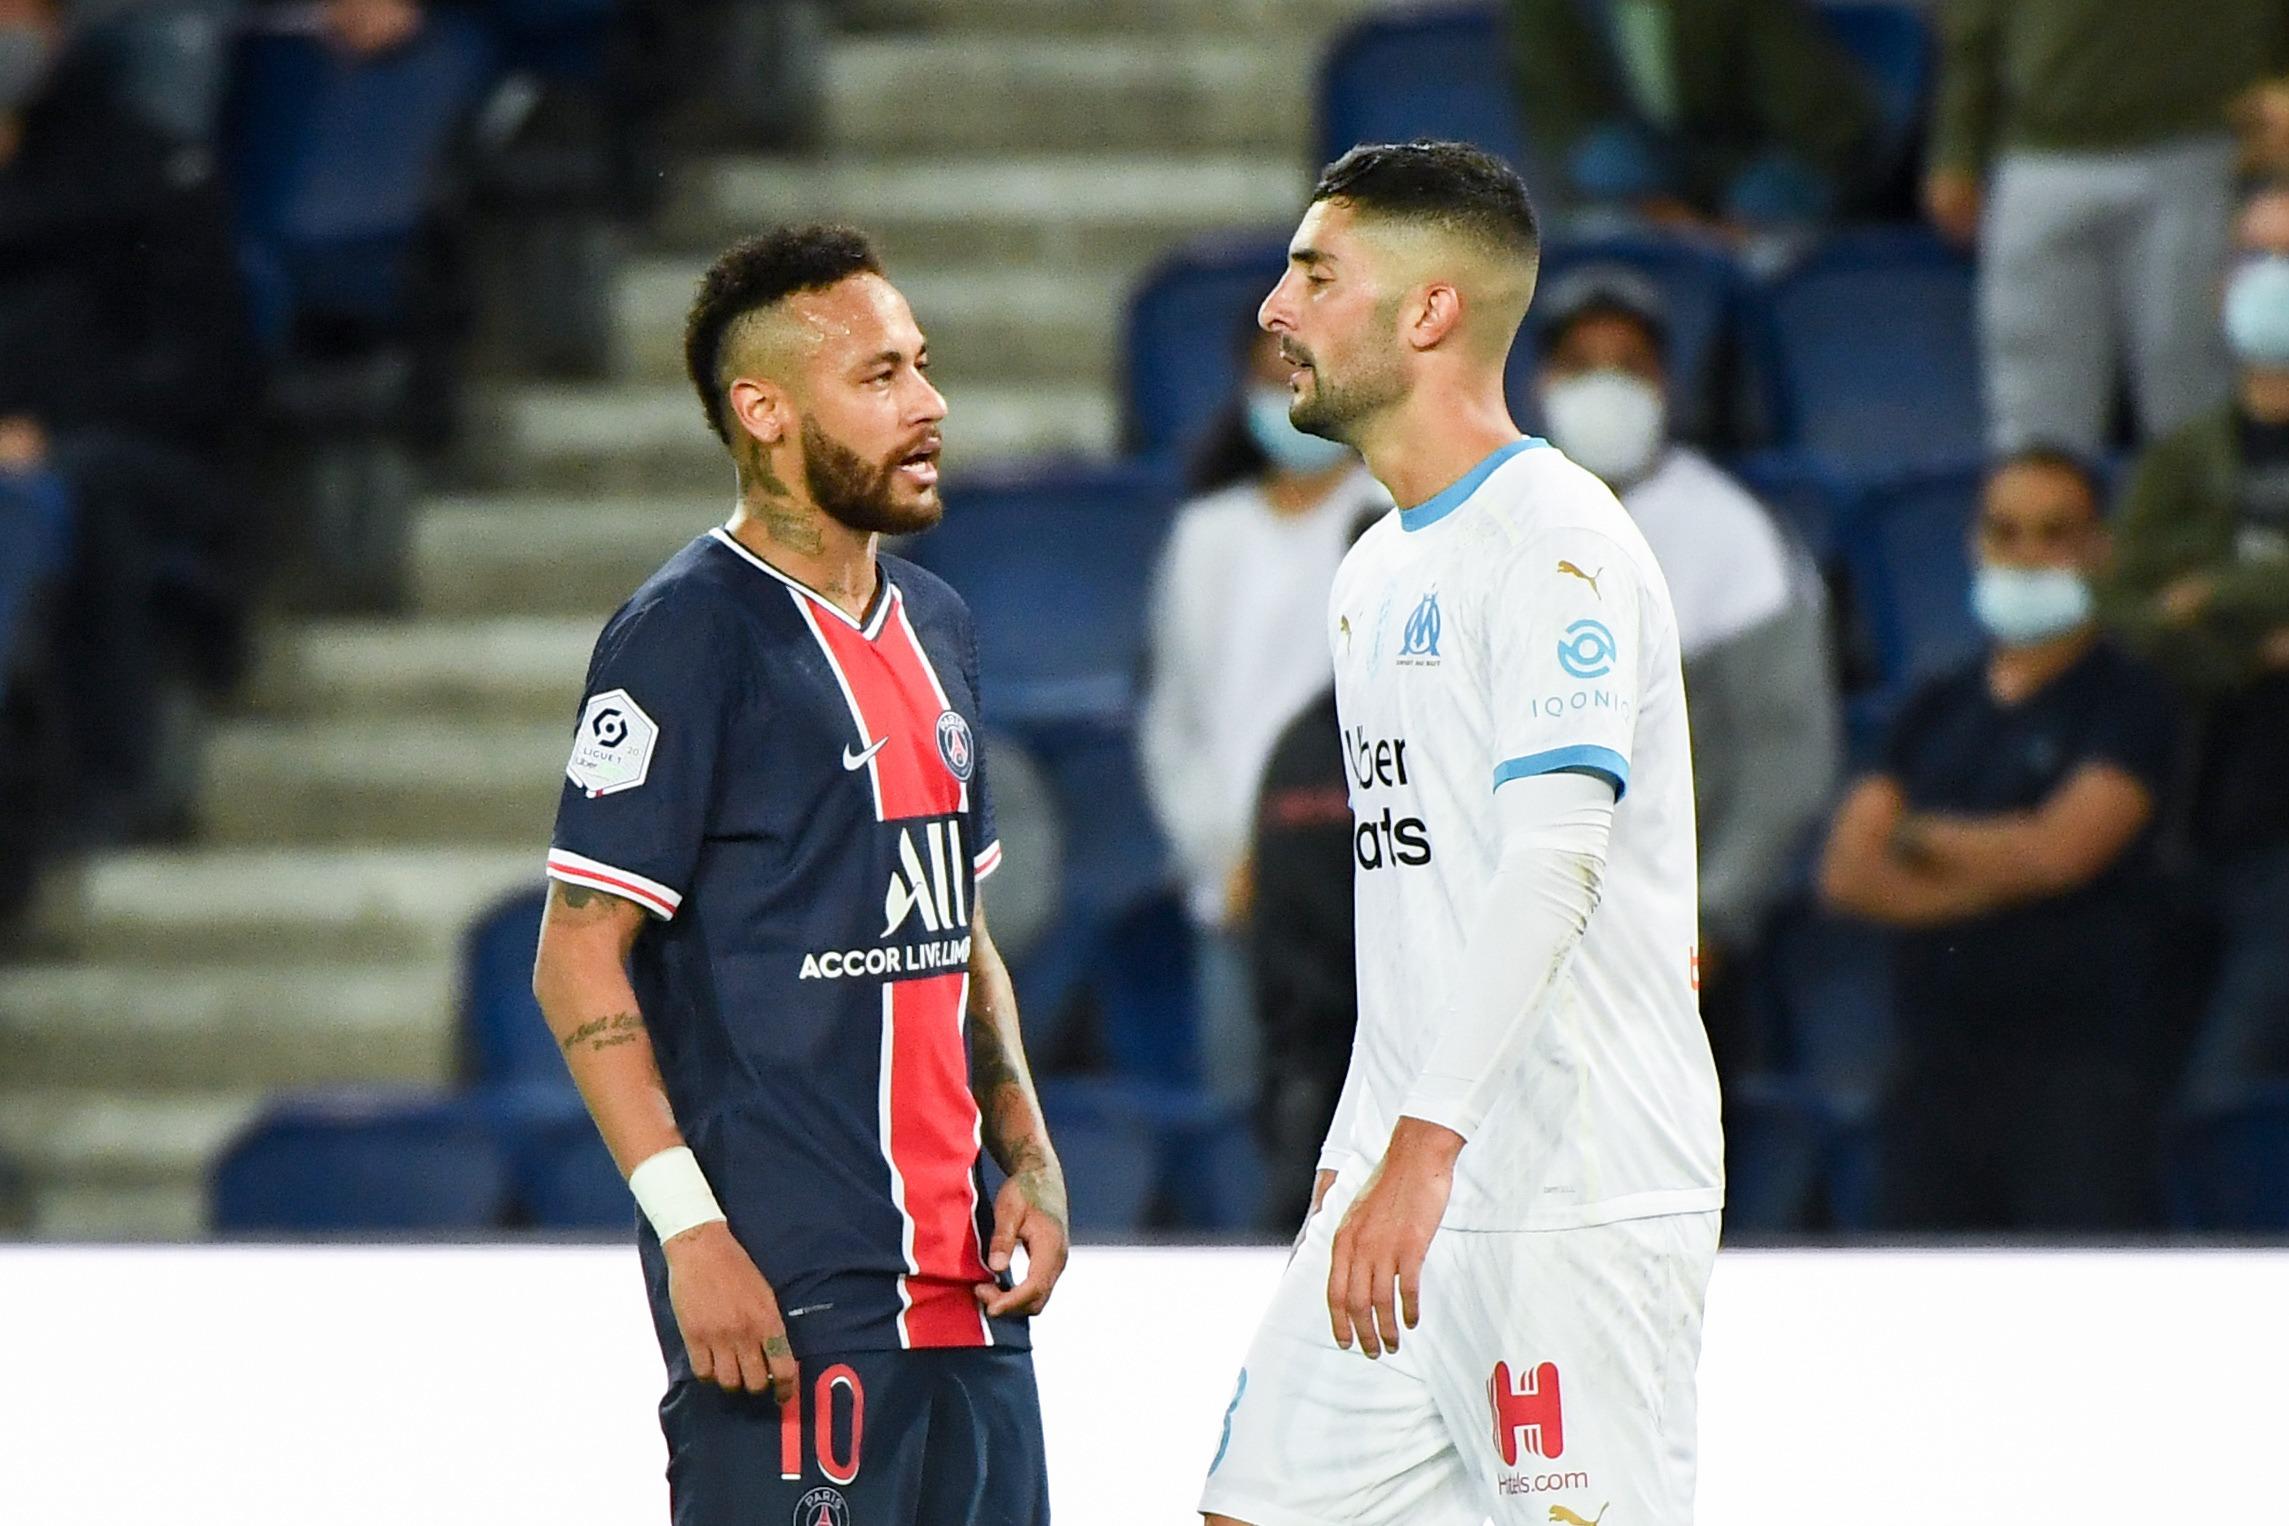 PSG/OM (0-1) - Neymar aurait eu des propos homophobes envers Alvaro